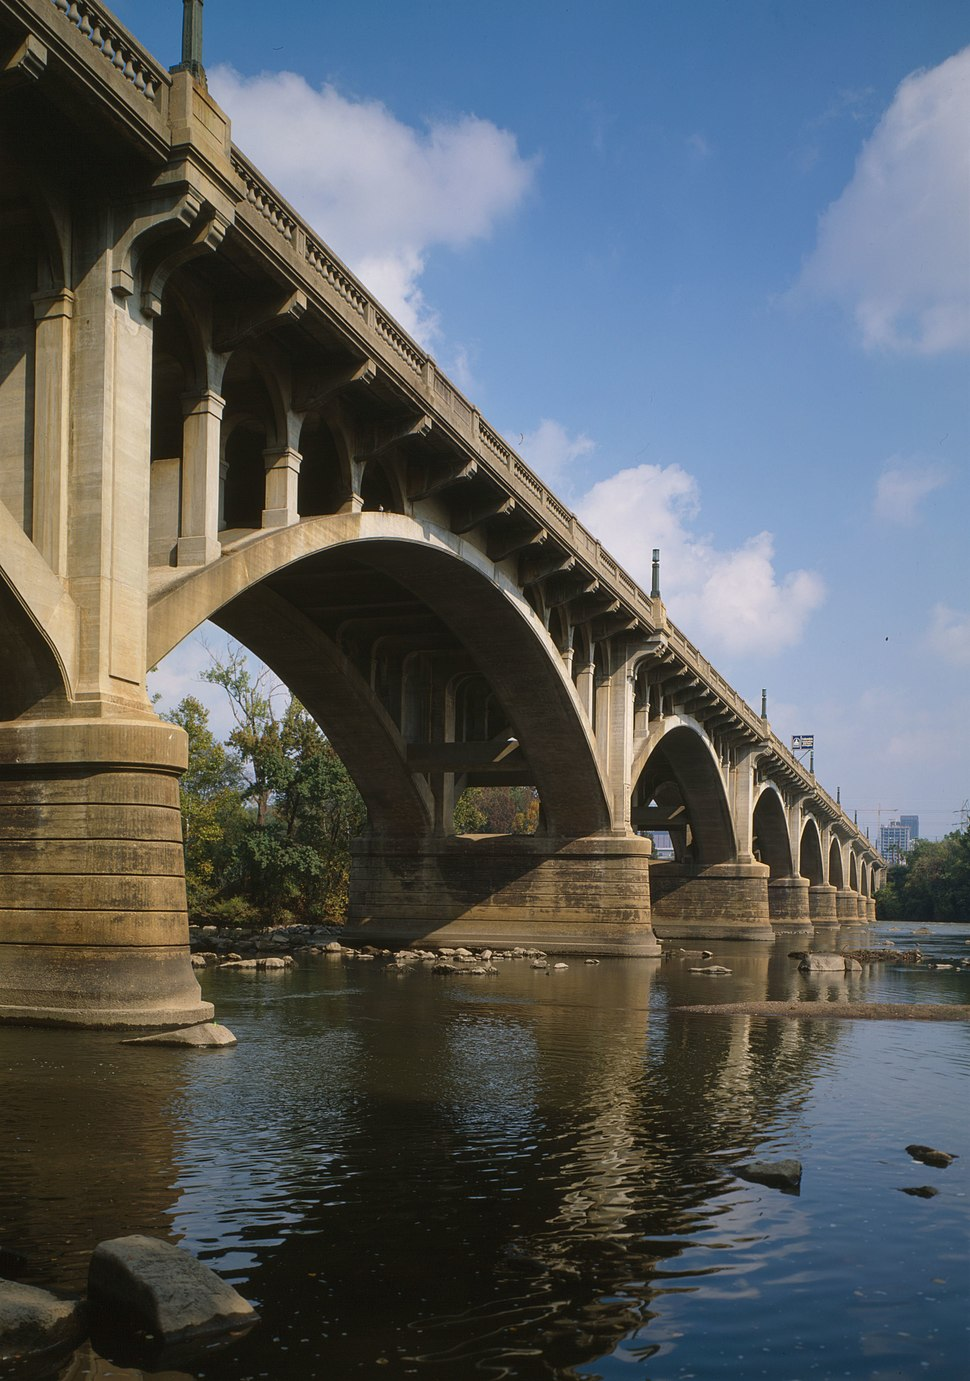 Gervais Street Bridge, Gervais Street spanning Congaree River, Columbia (Richland County, South Carolina)